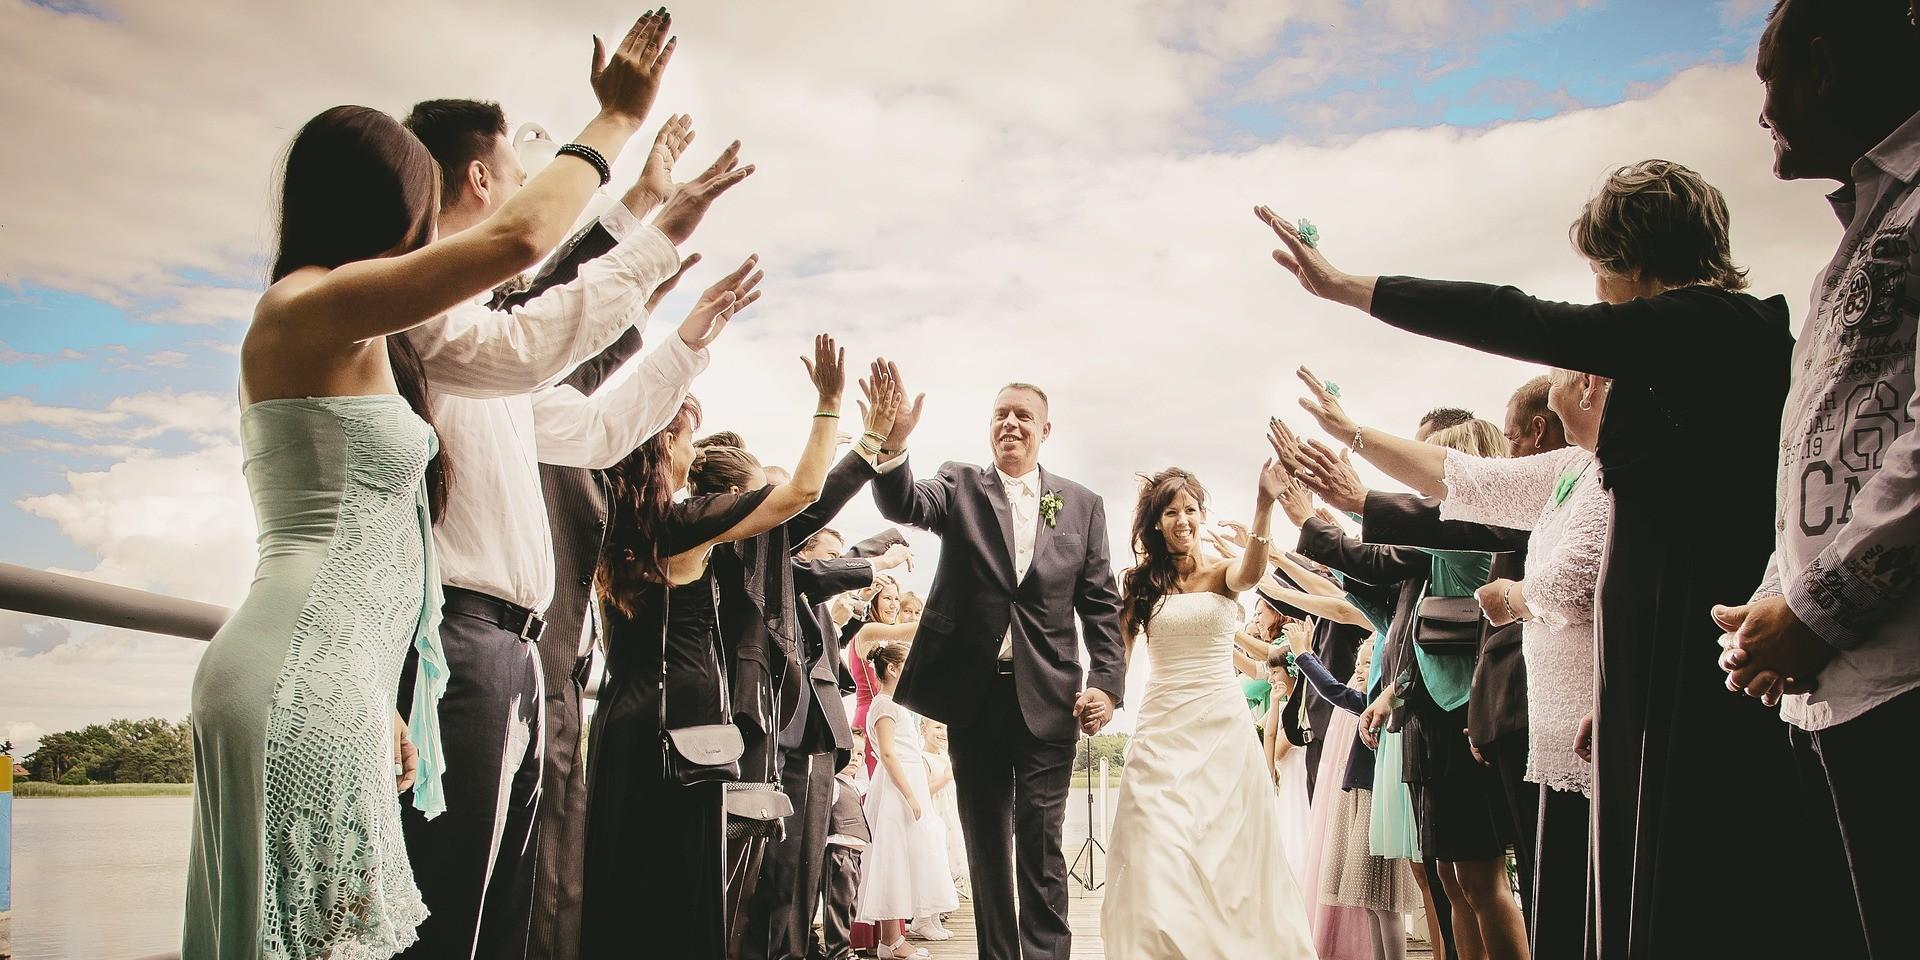 Policija kod Sesveta upala na svadbu i uhitila mladi par